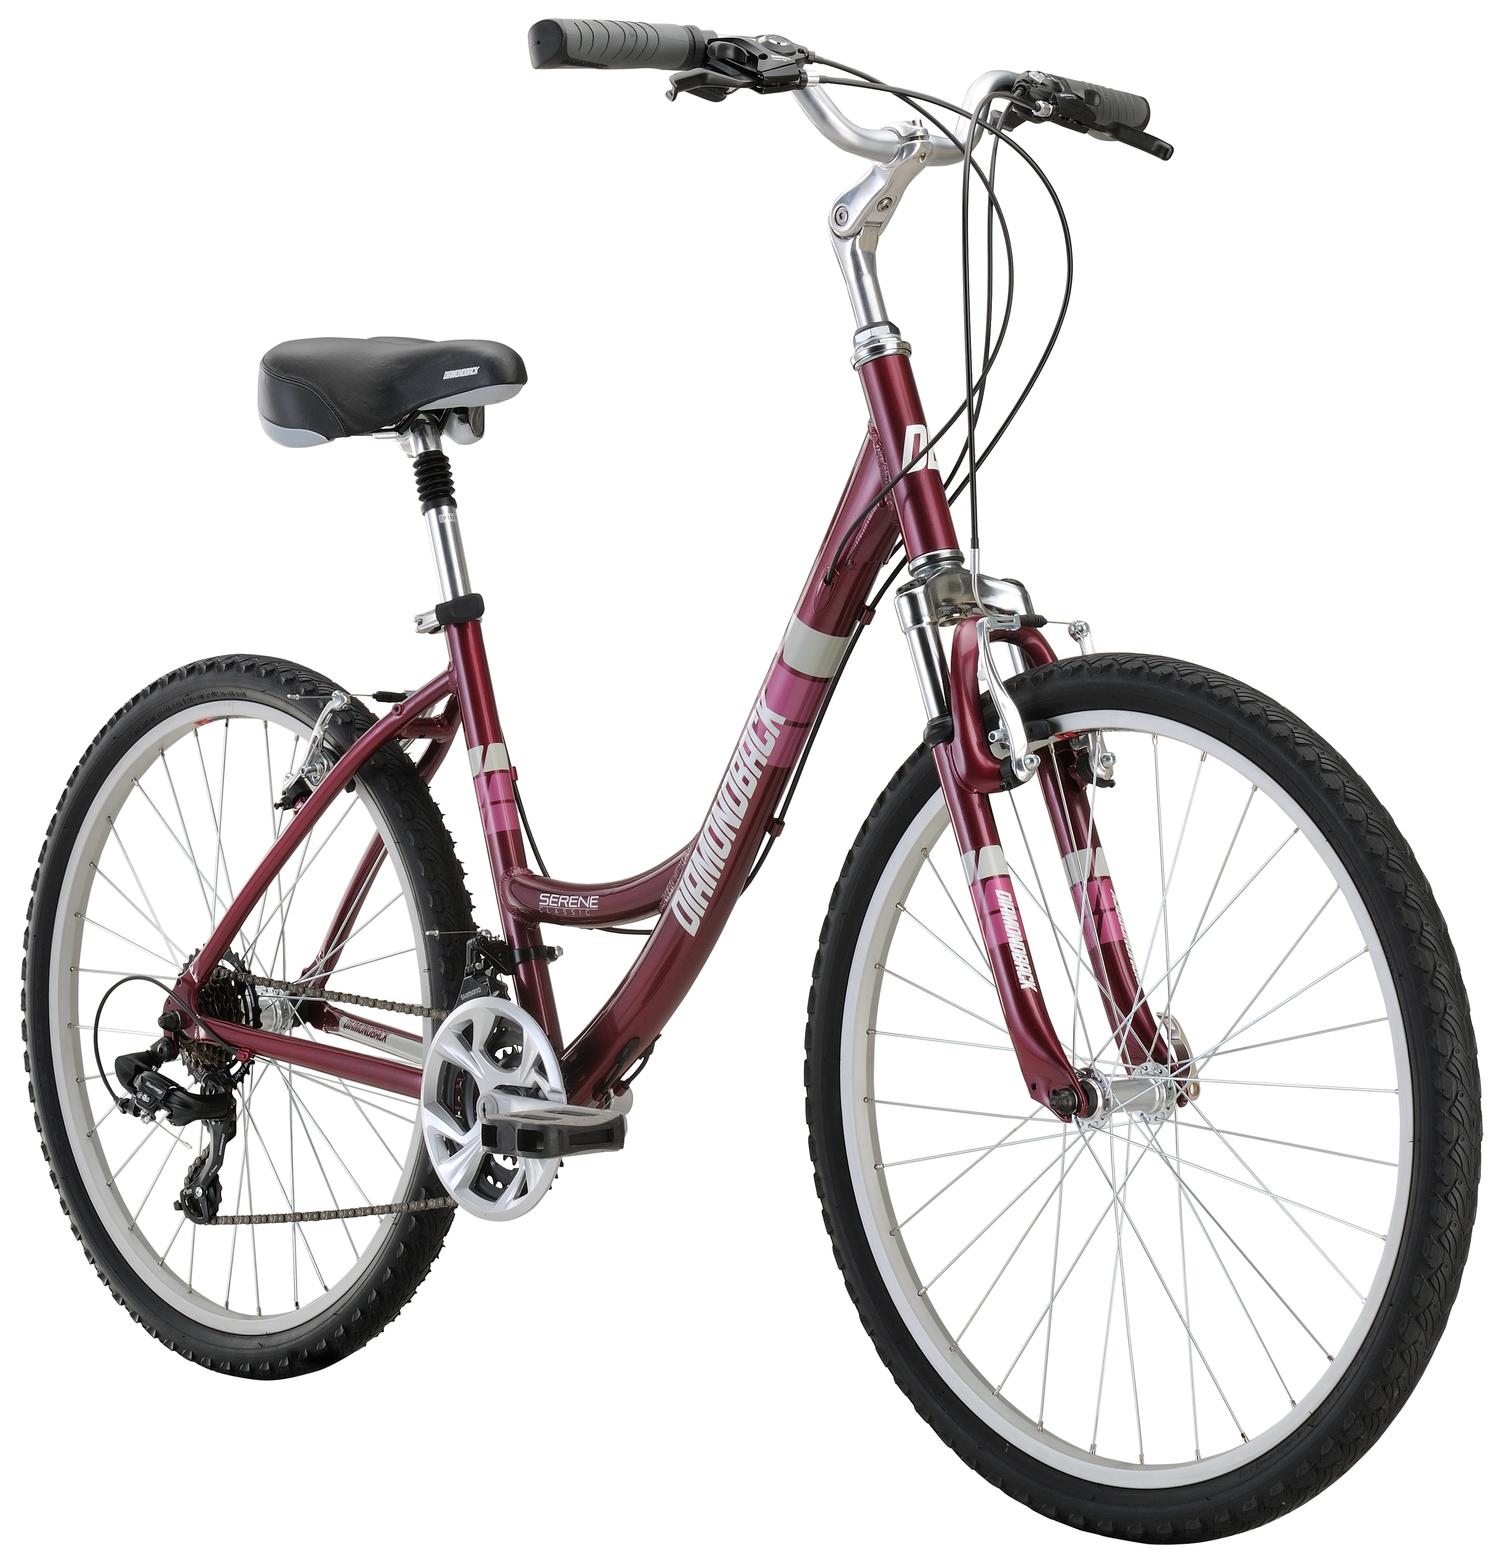 City Bikes 17 SereneClassic Plm angle